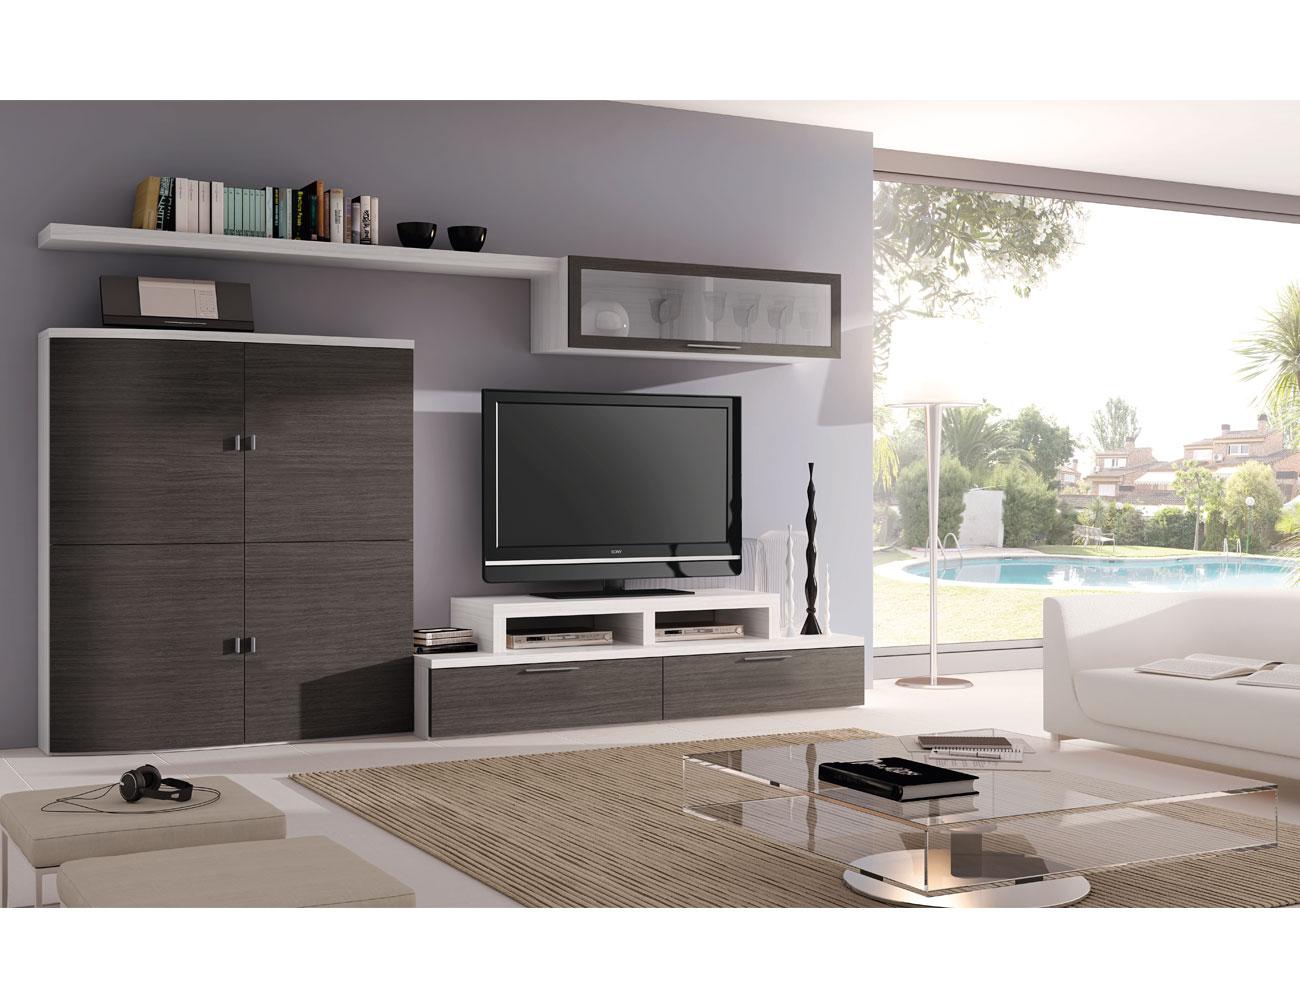 719 mueble salon comedor paisaje1